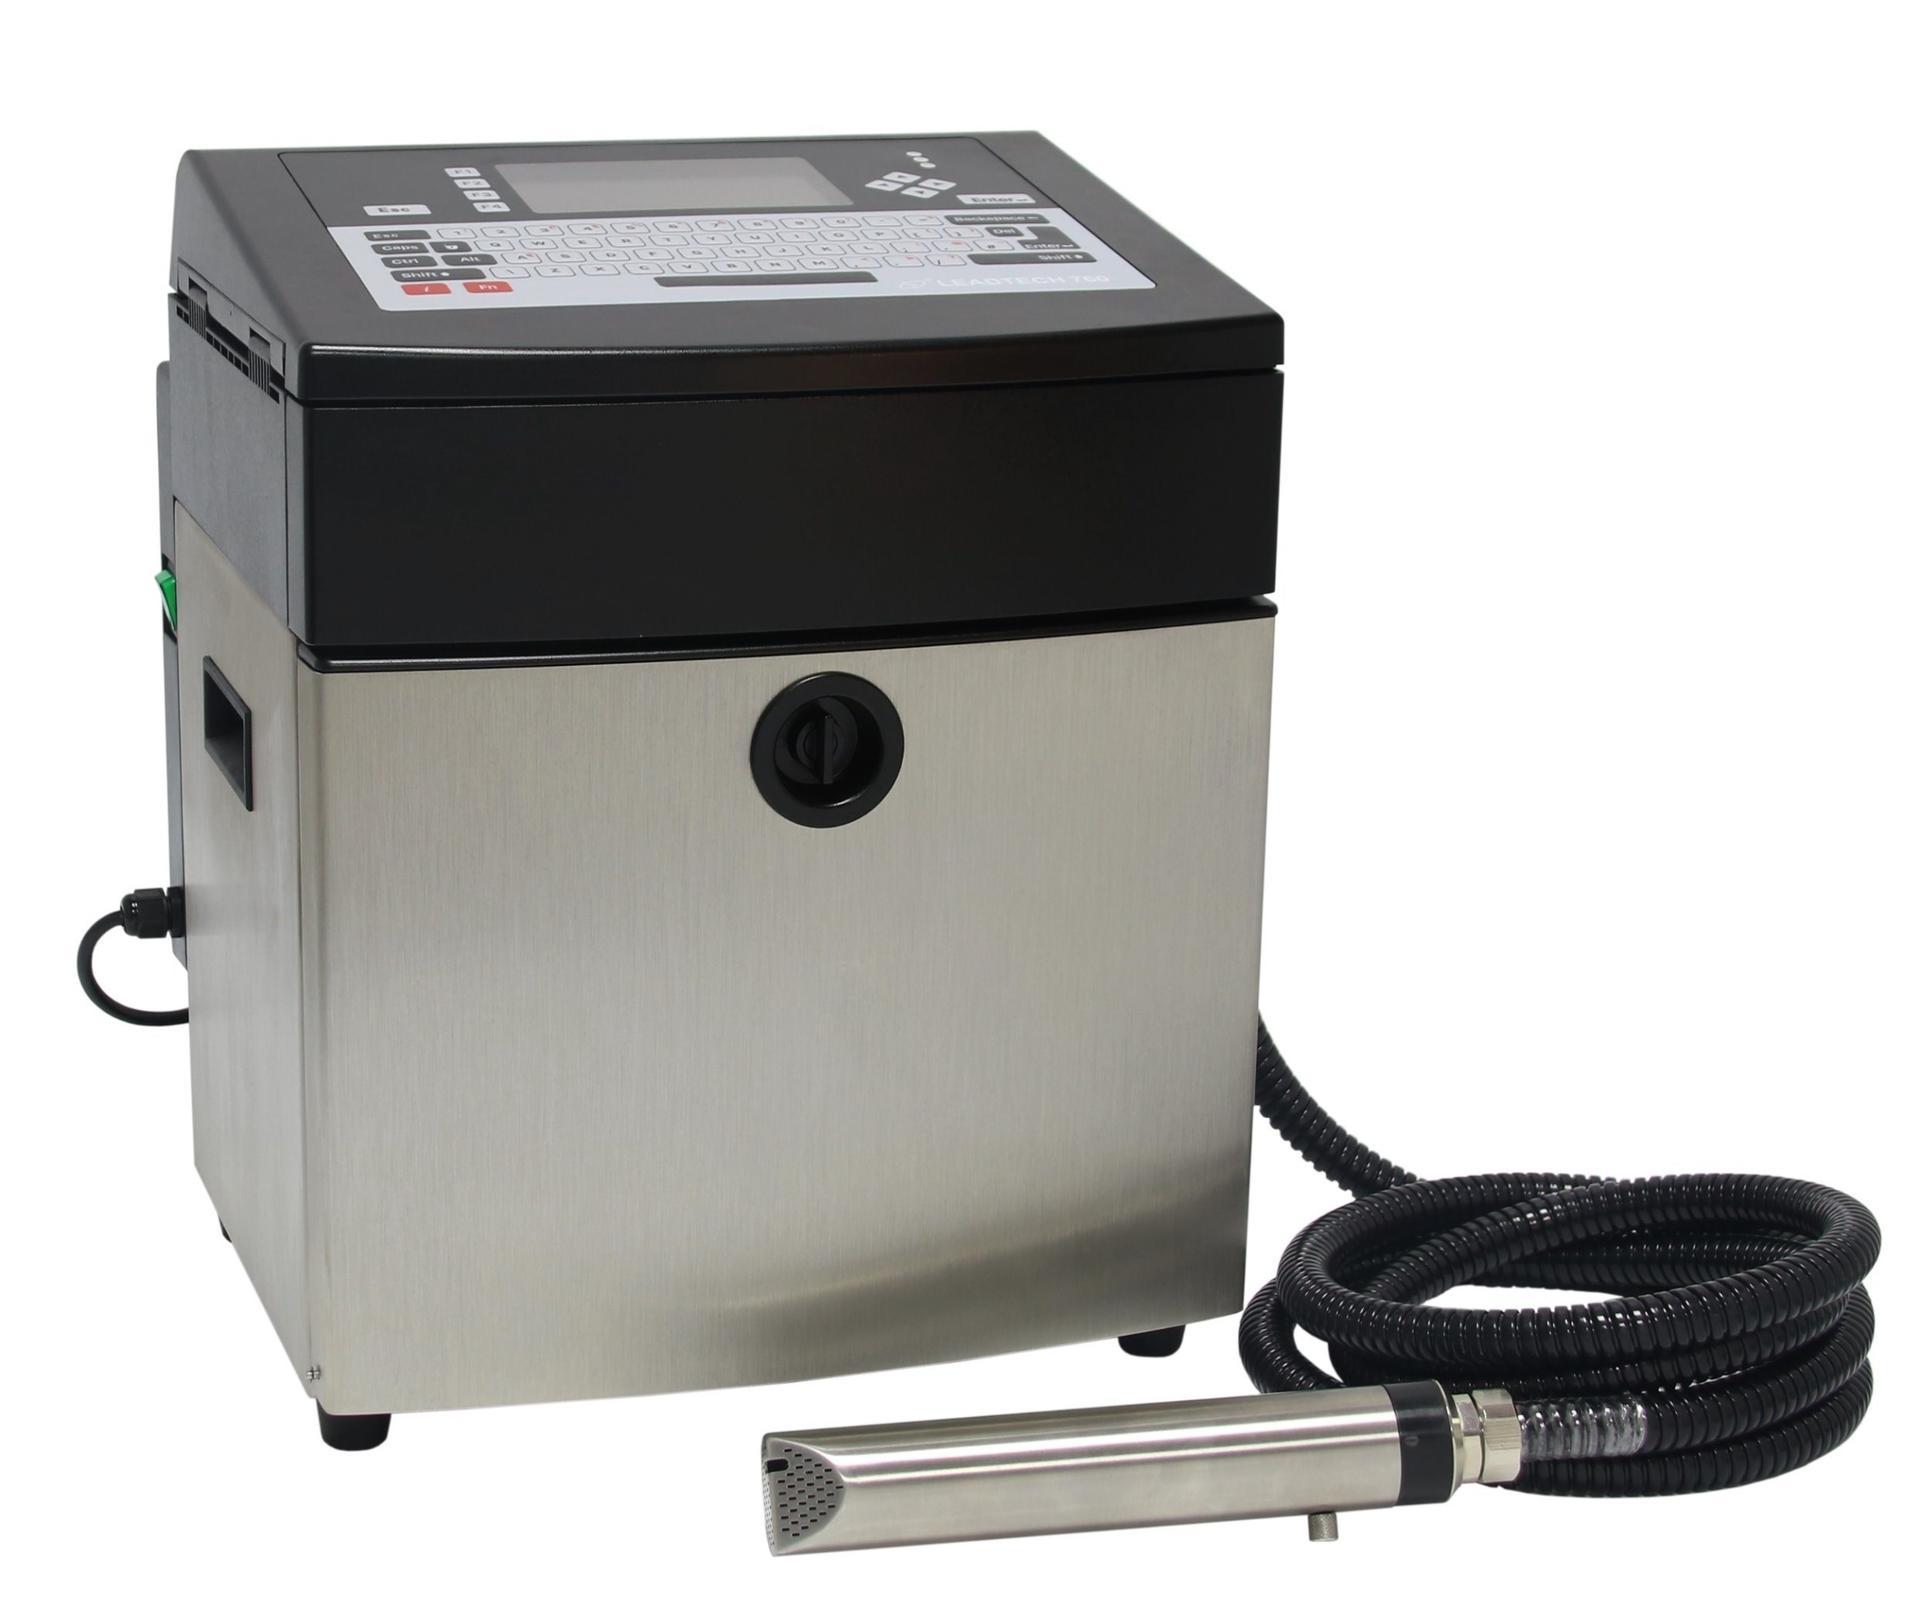 Lead Tech Lt760 Cij Inkjet Printer for Tuna Can Coding